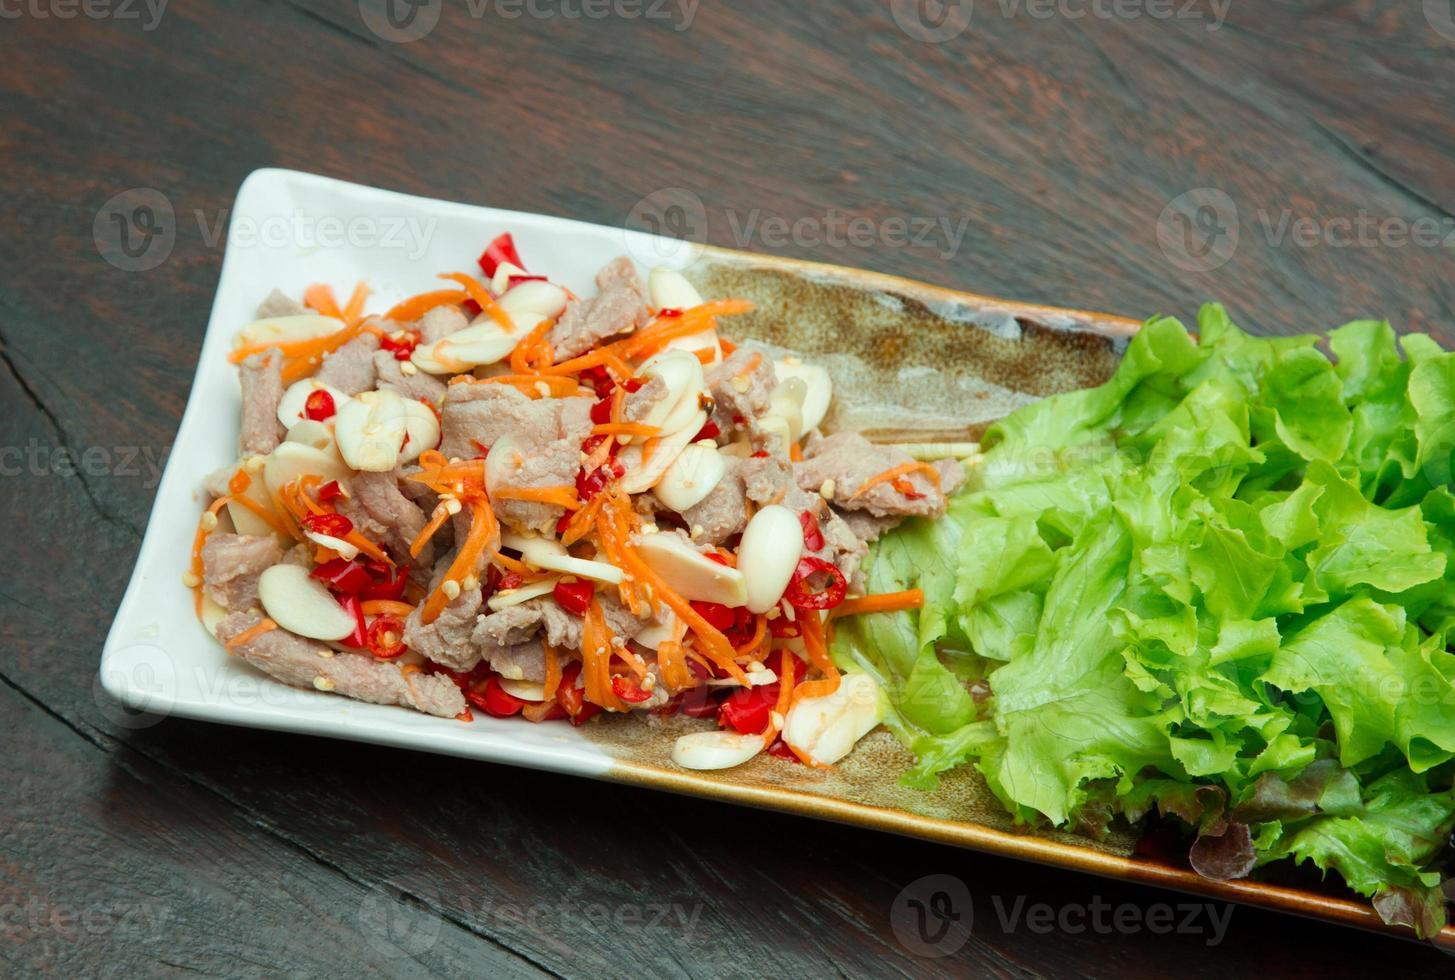 Boiled pork with lime, garlic and chili sauc photo